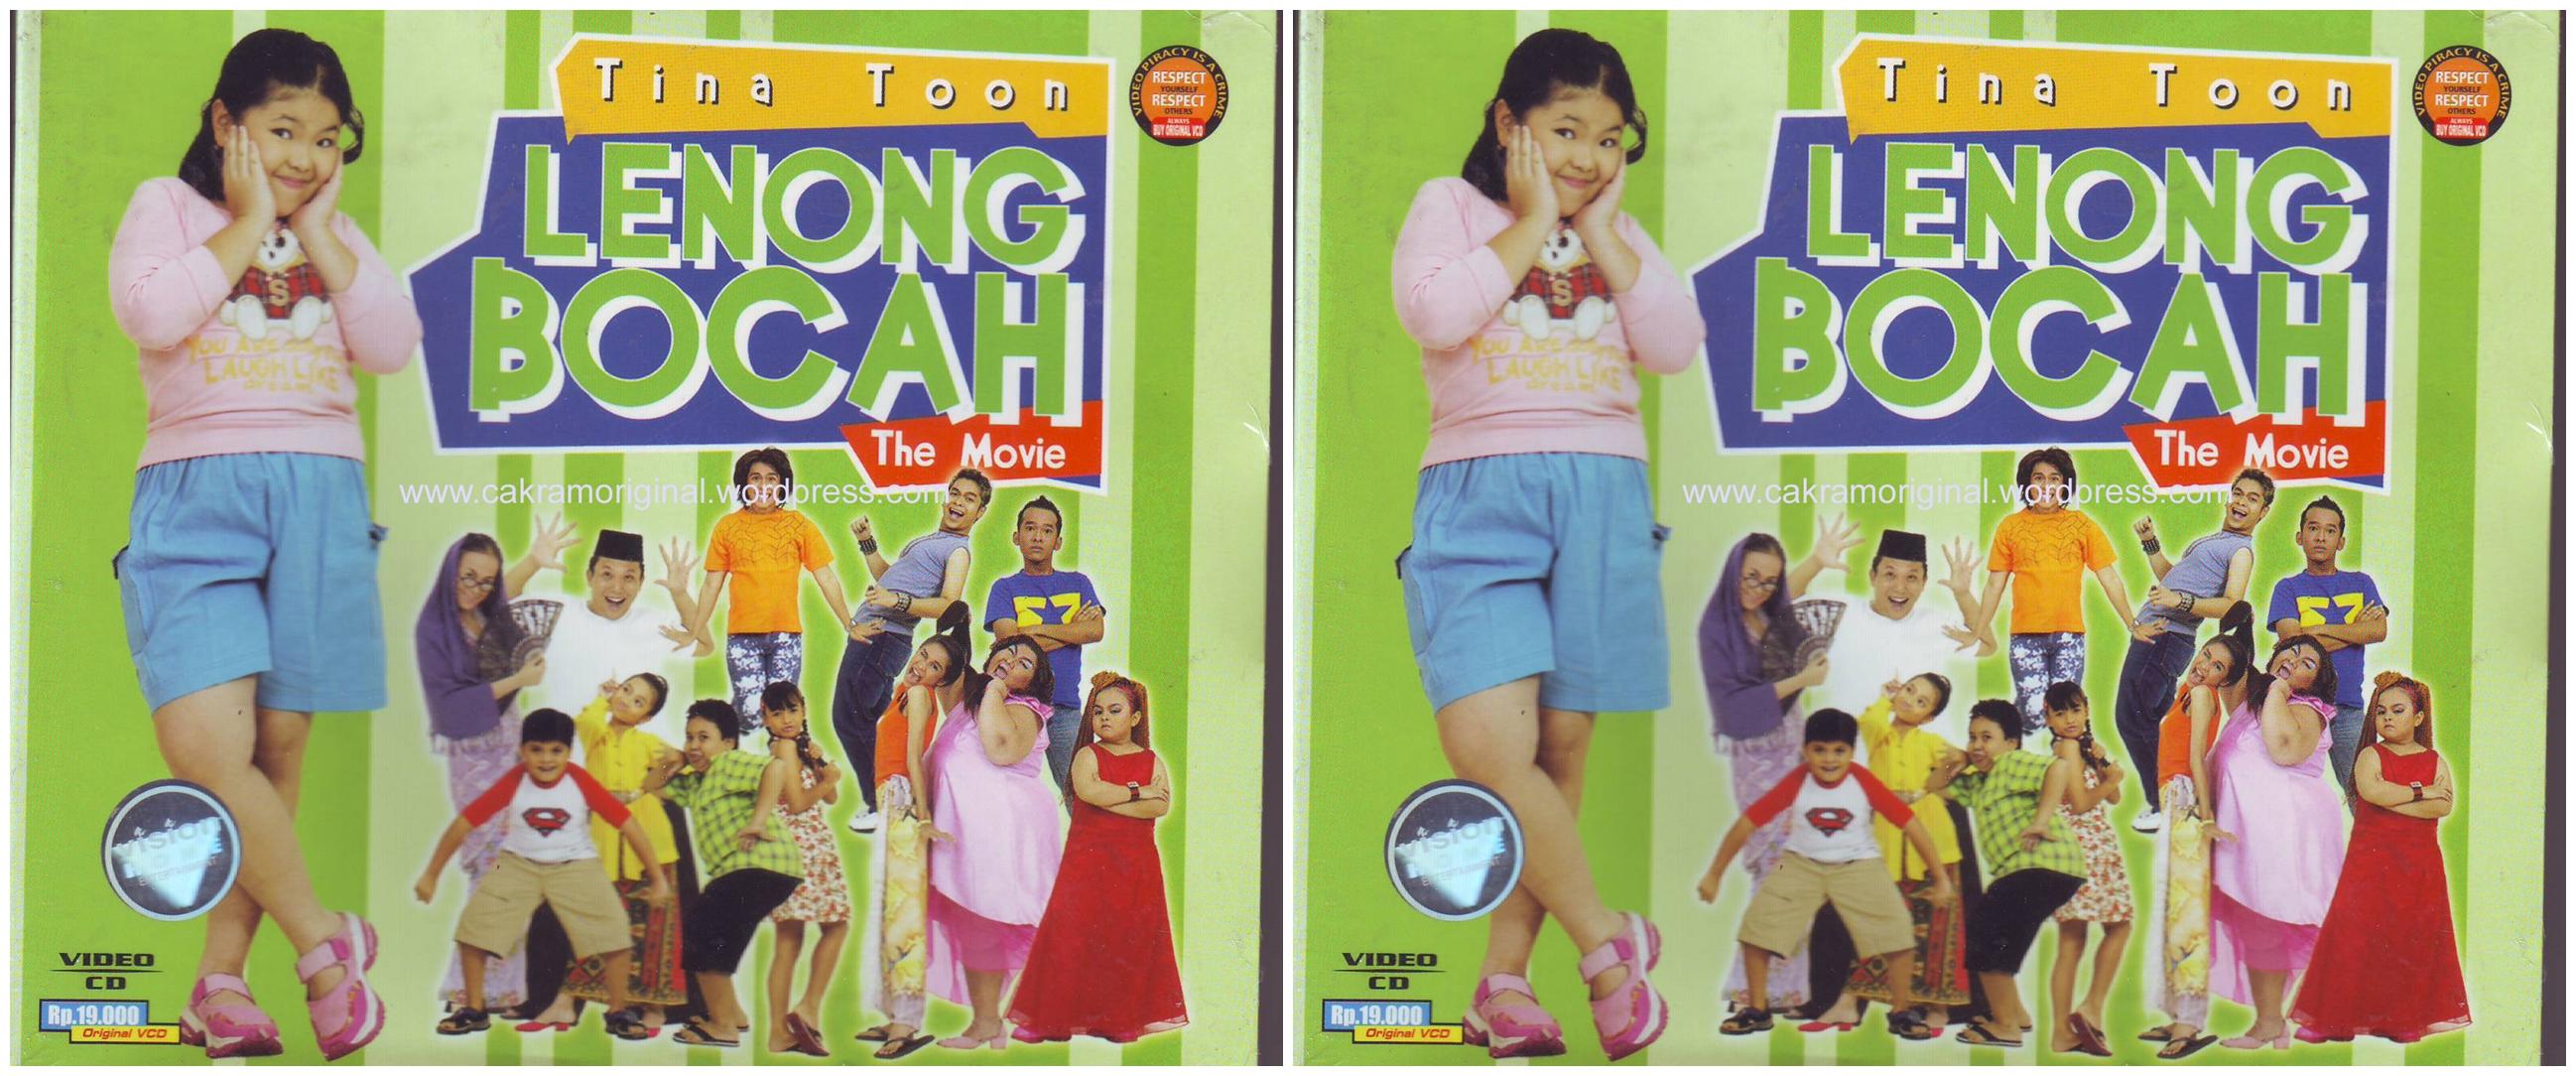 Kabar terbaru 5 pemain Tina Toon dan Lenong Bocah The Movie